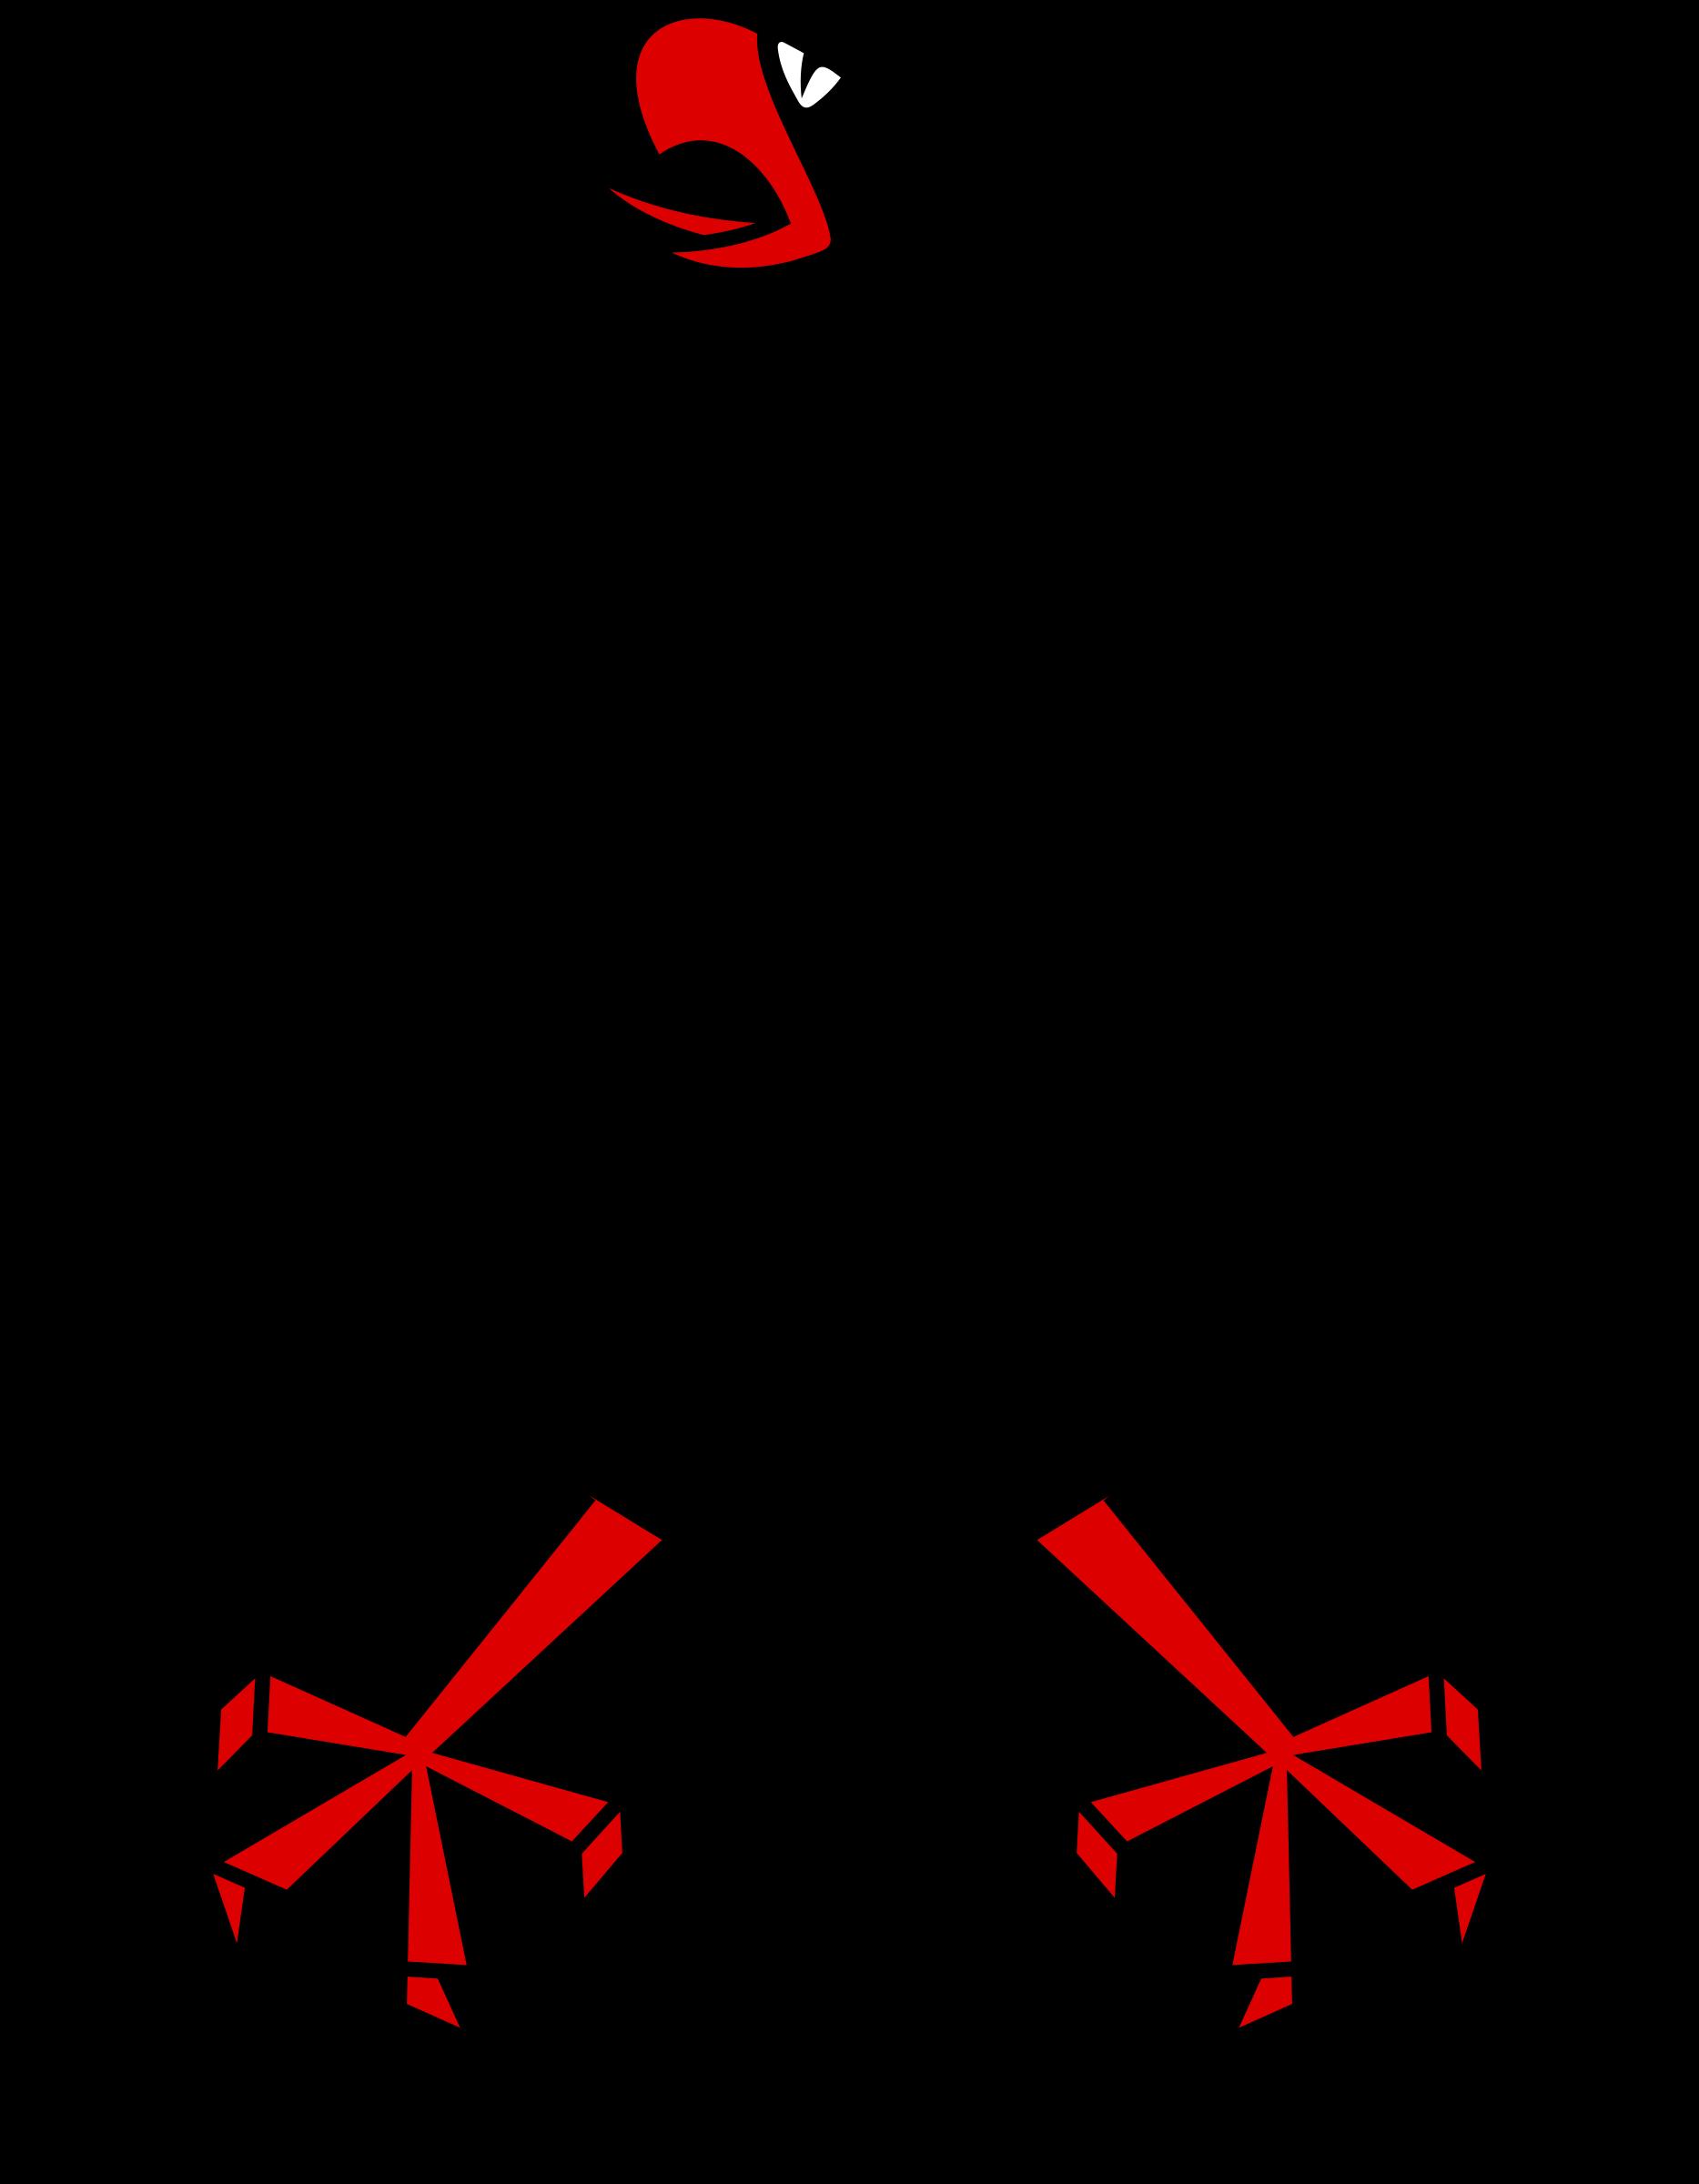 Germany logo clipart transparent download Eagle Clipart Logo Germany Coat Of Arms - Clip Art Library transparent download